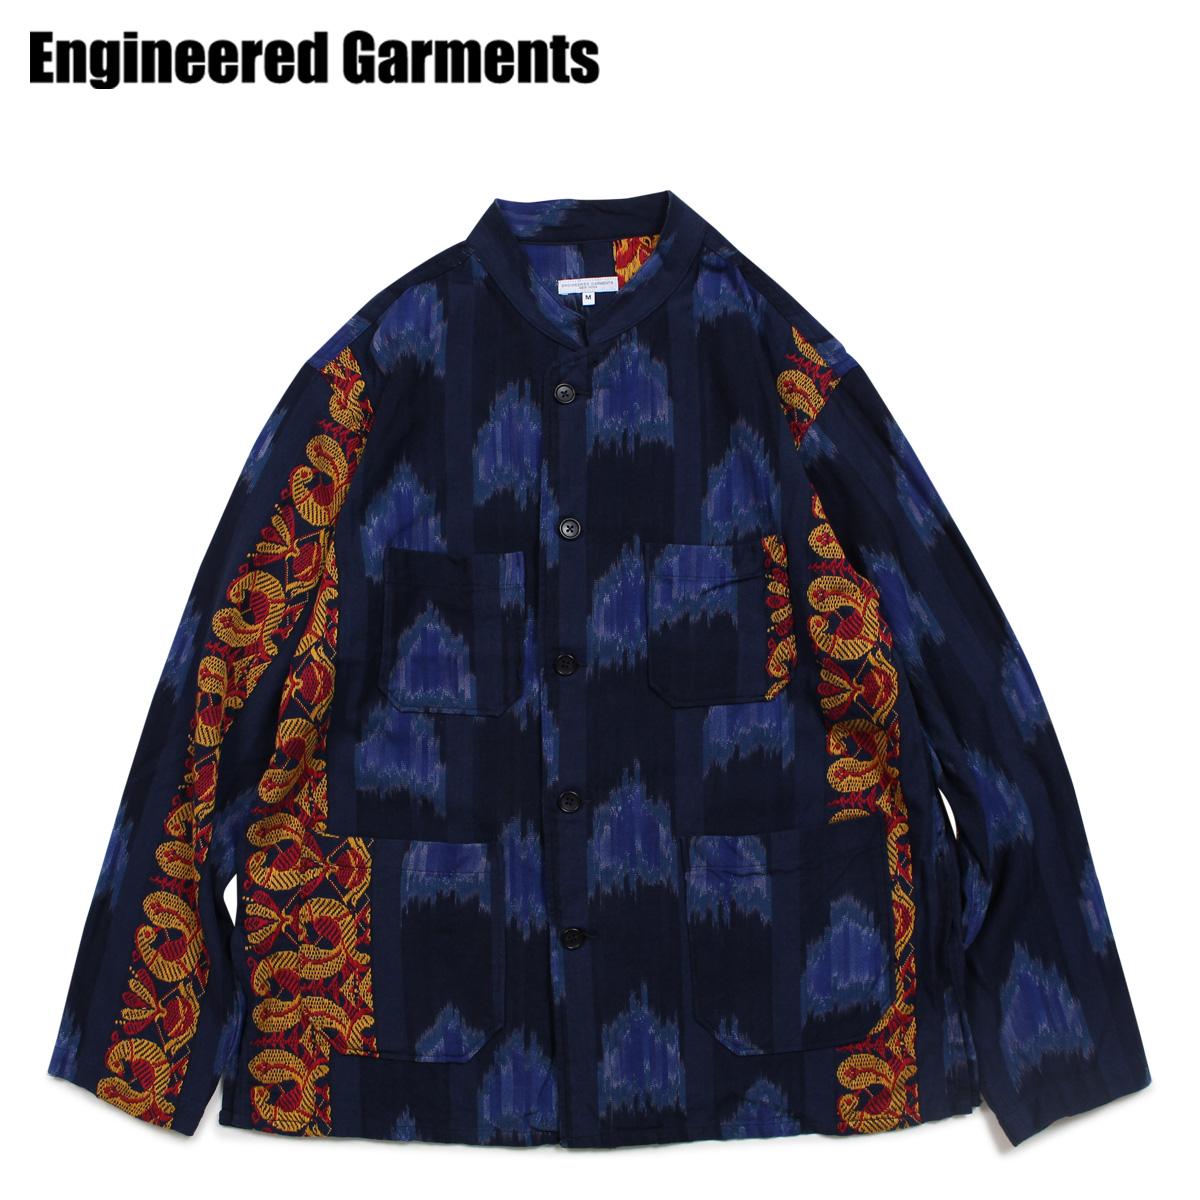 ENGINEERED GARMENTS DAYTON SHIRT エンジニアドガーメンツ シャツ 長袖 バンドカラーシャツ メンズ ネイビー 19SA009-Q [4/24 新入荷]